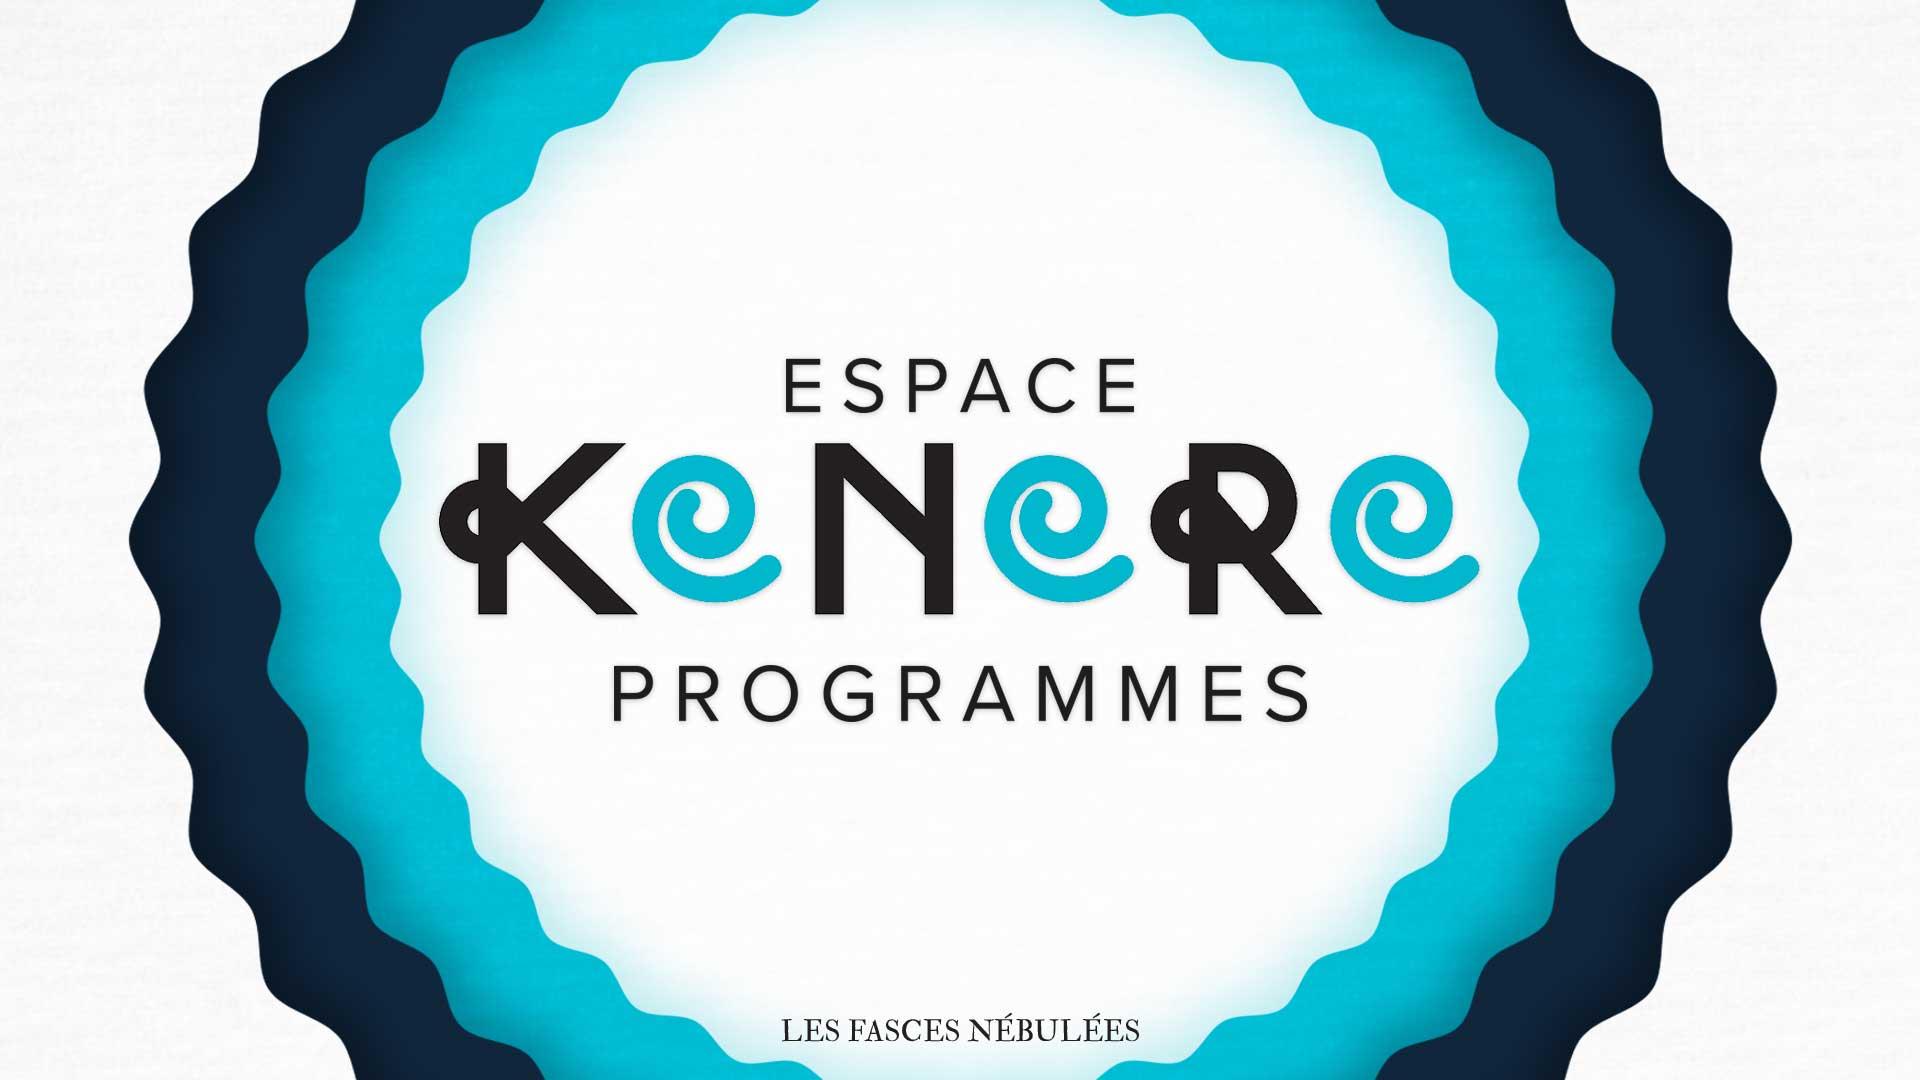 Espace Kenere  Programmes